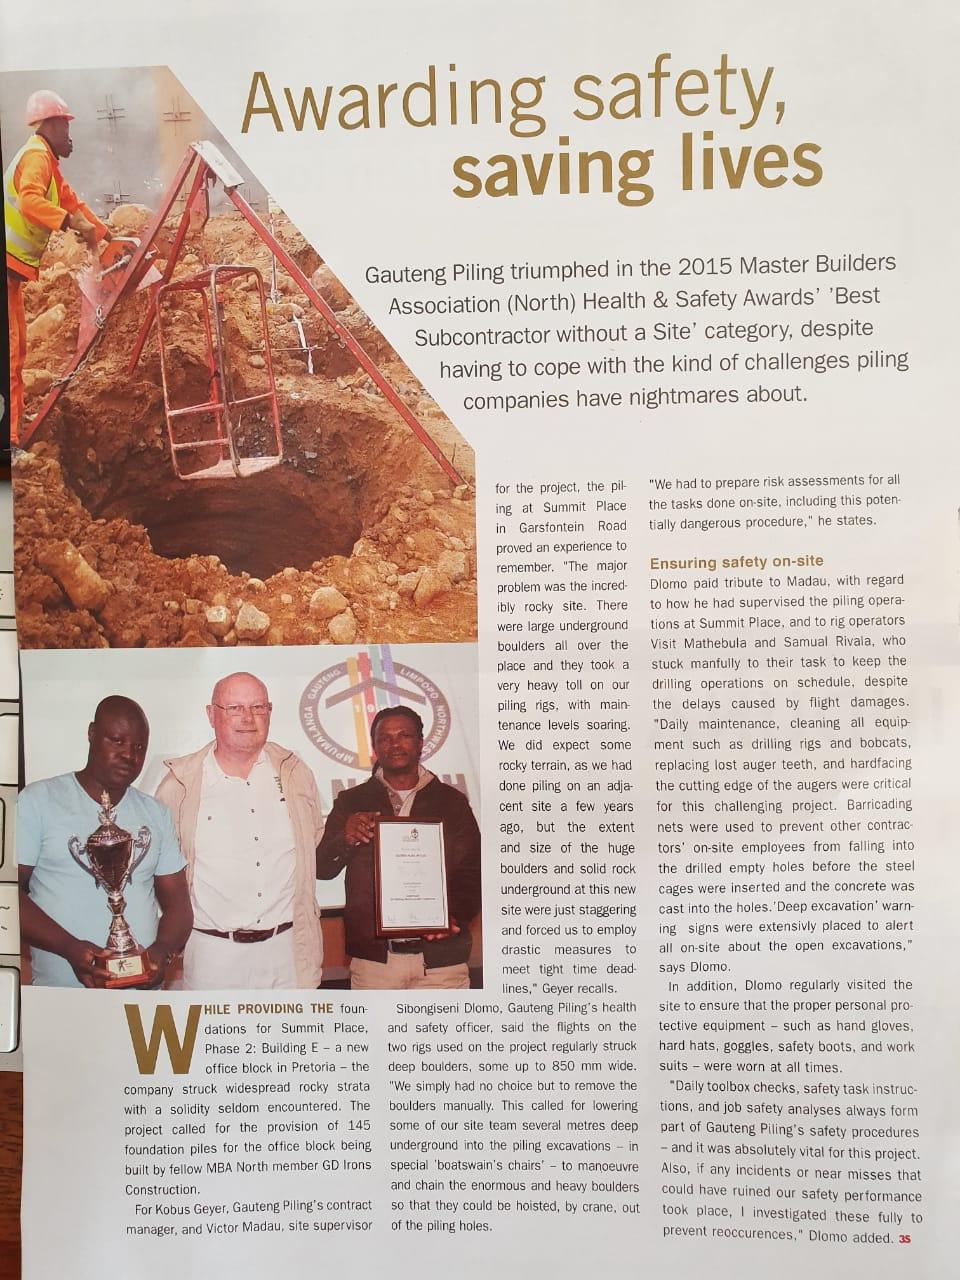 191021-Awarding-safety-saving-lives